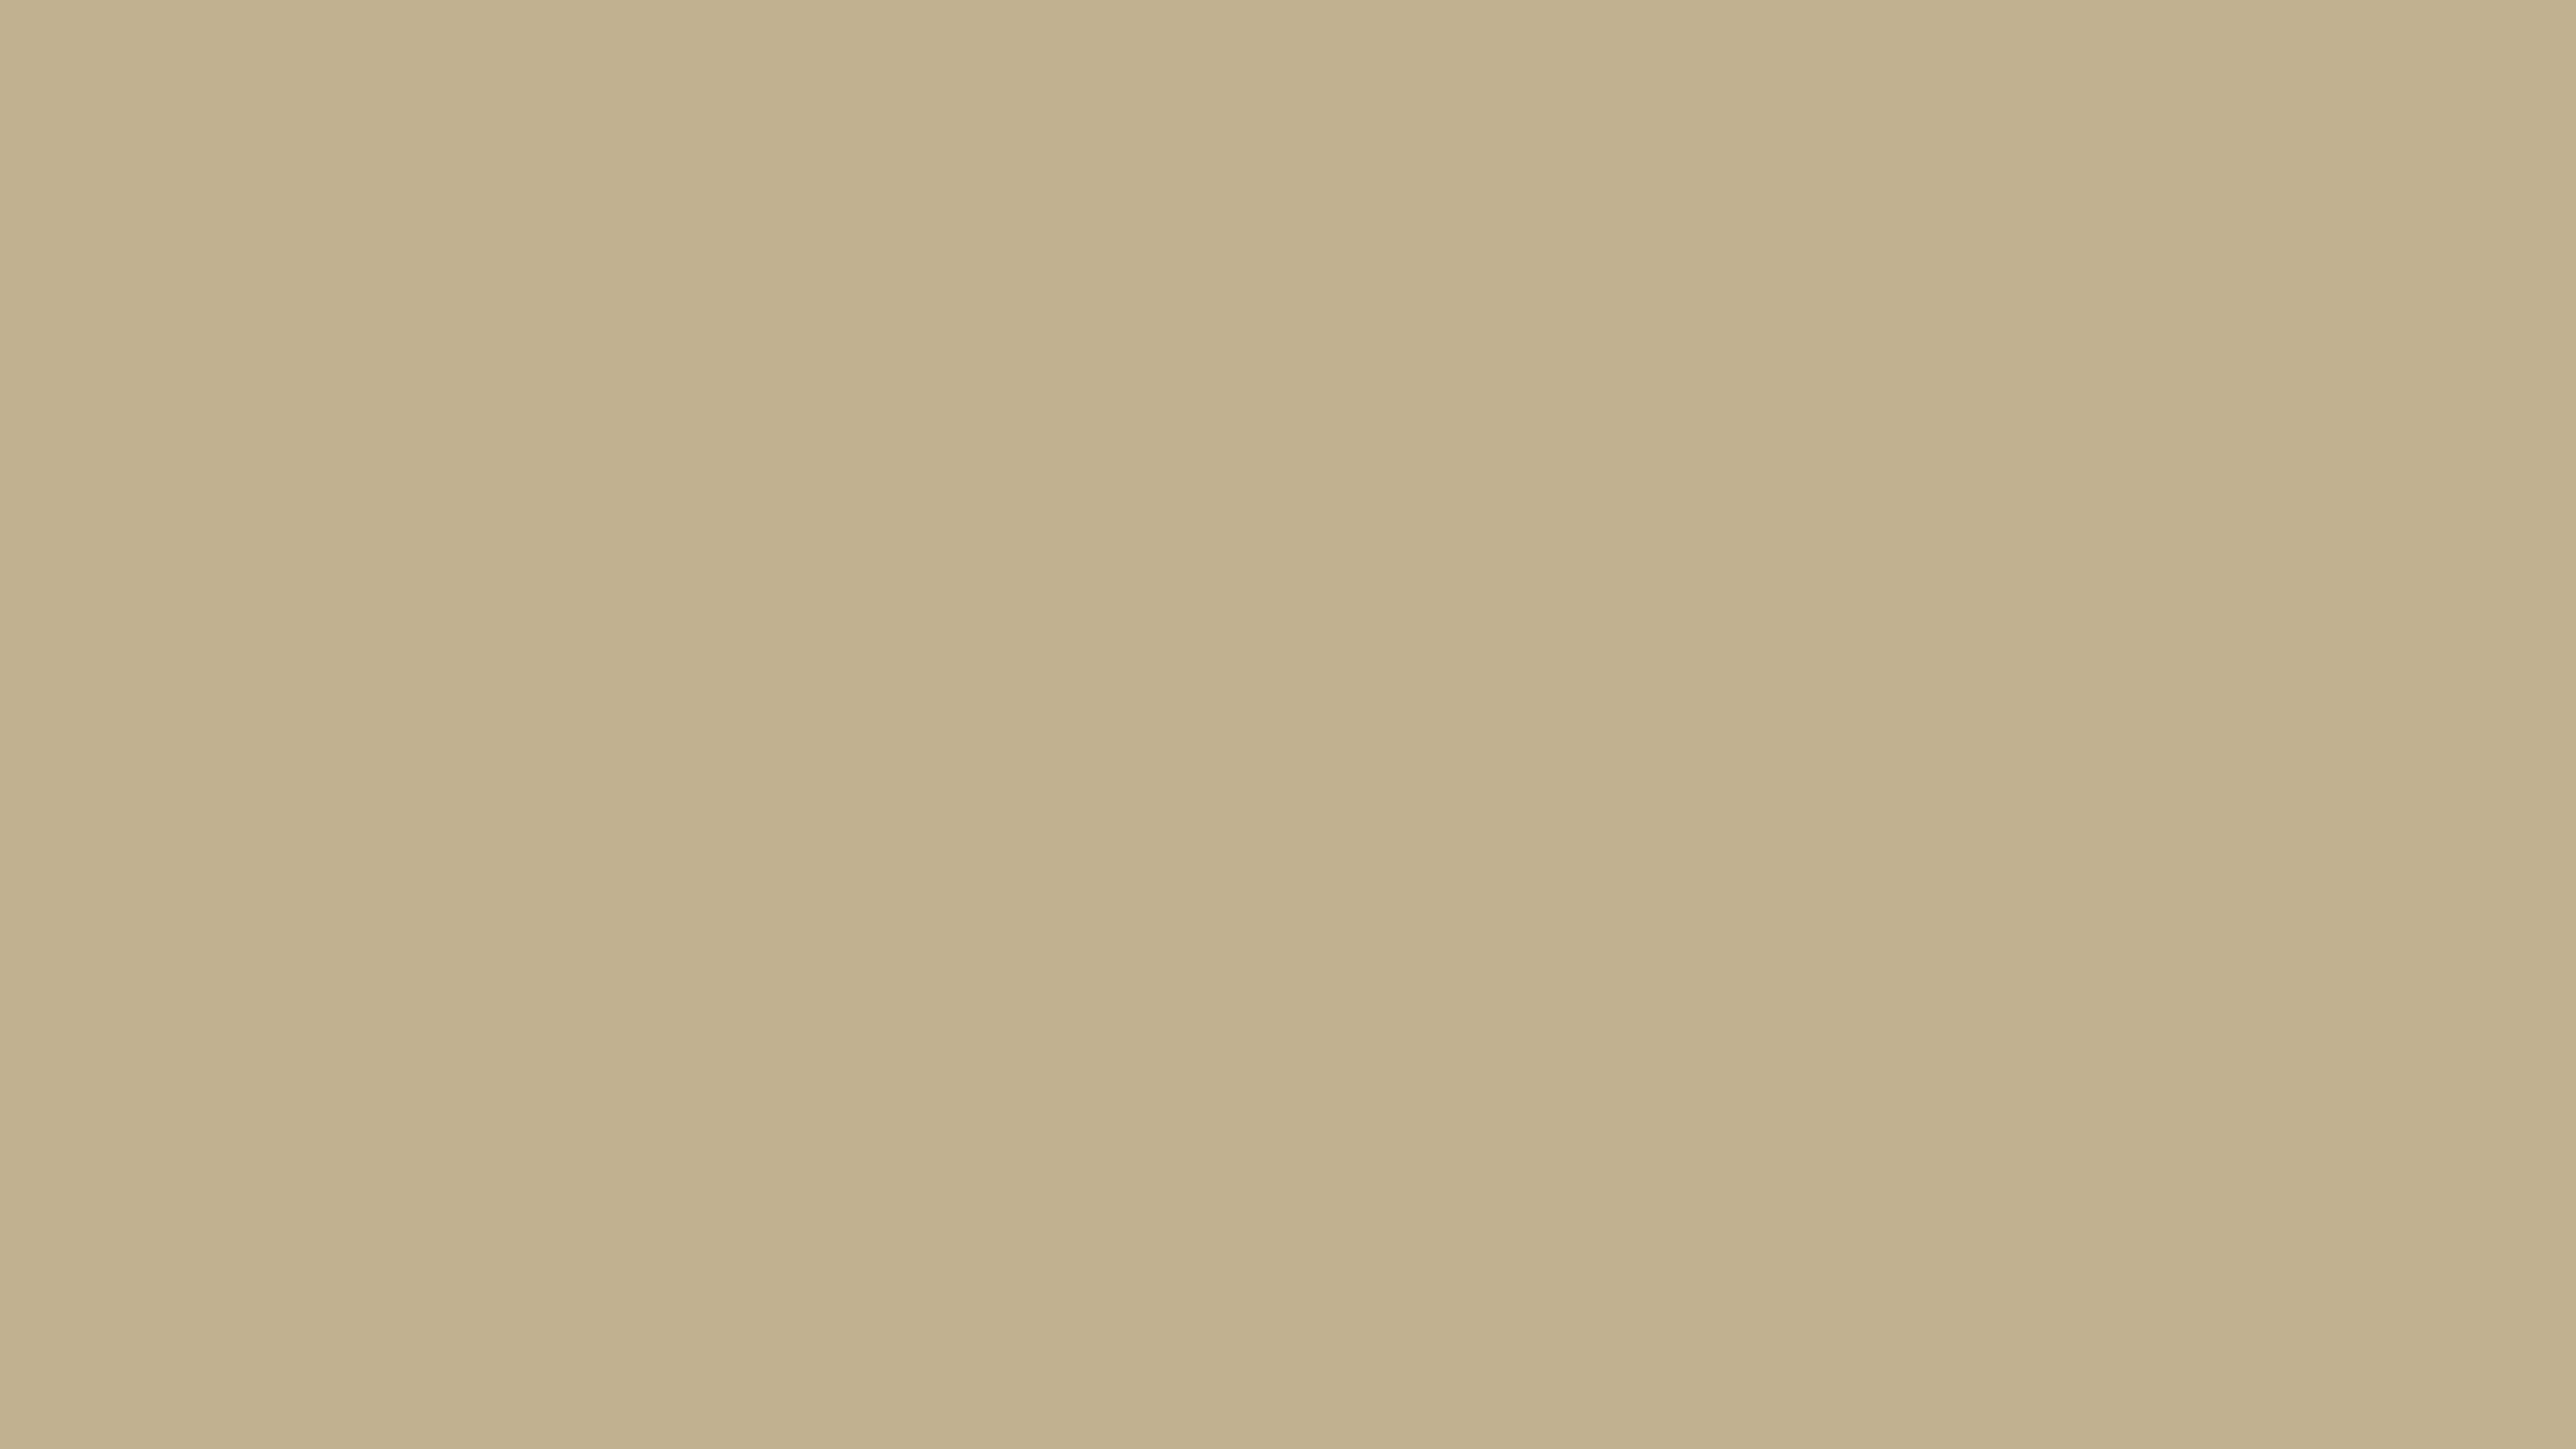 7680x4320 Khaki Web Solid Color Background